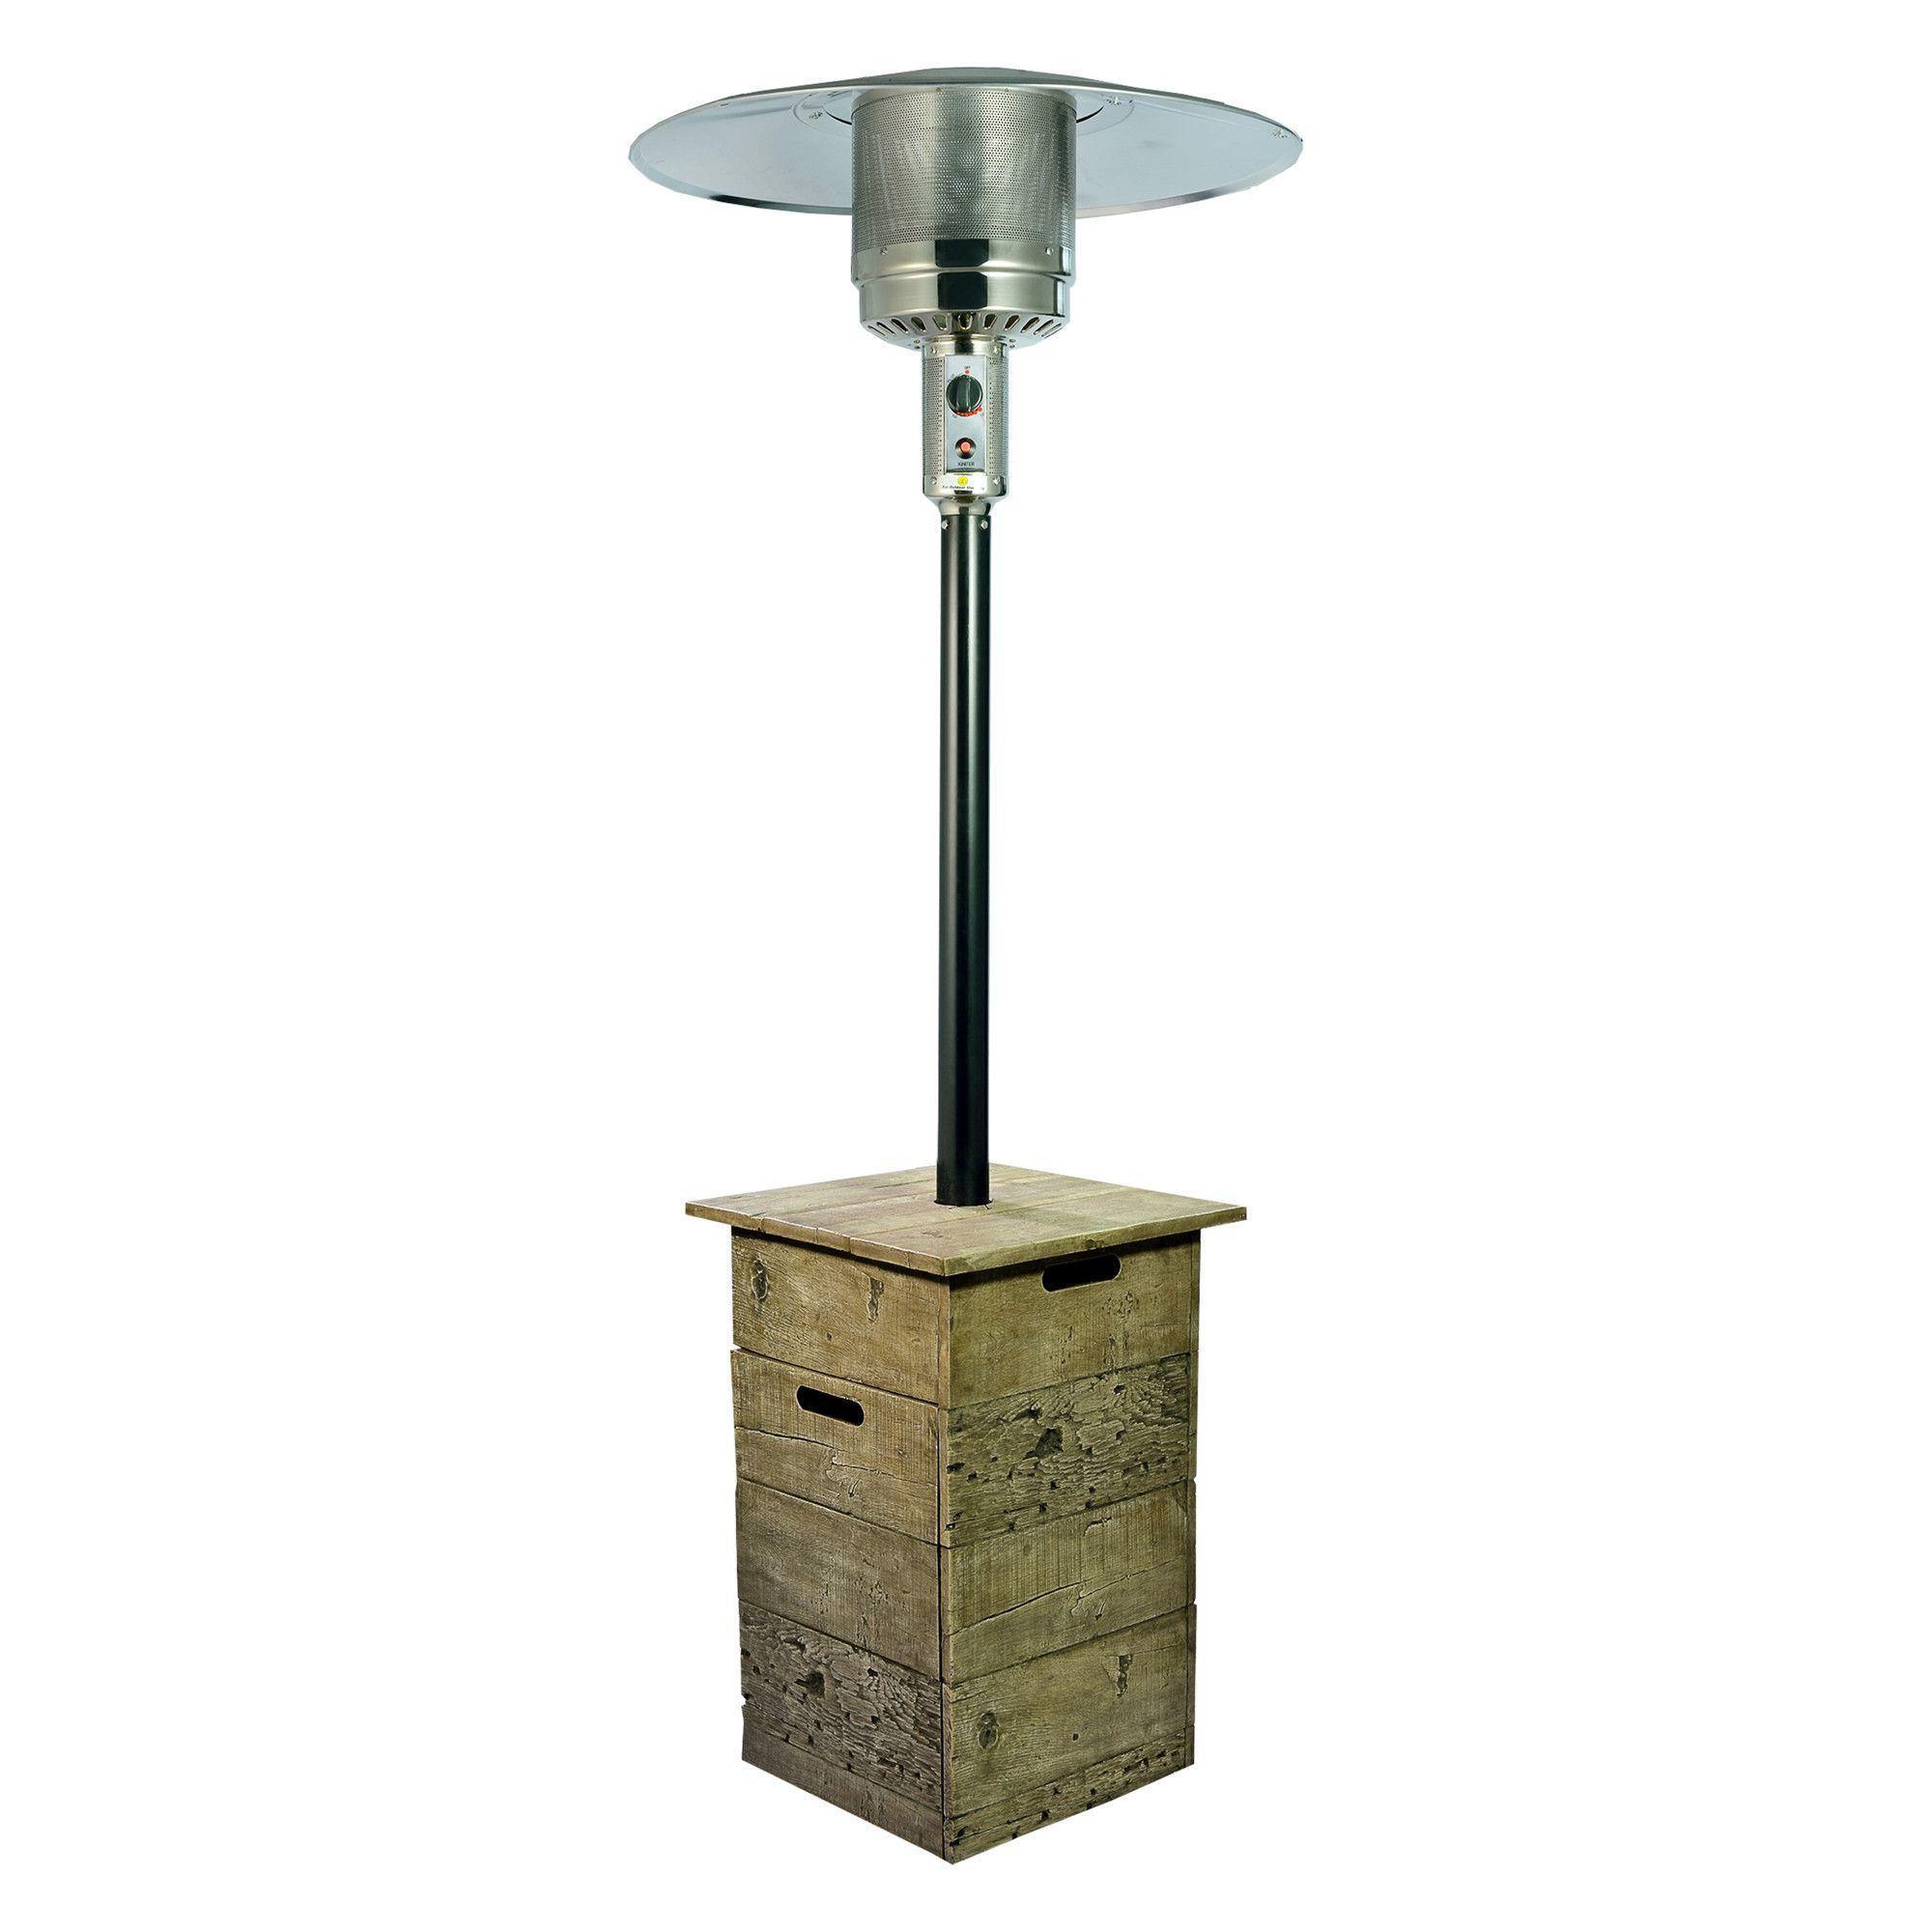 az cfm fire master patio slate hayneedle square product pit azpatioheaterssquareslatefirepit heaters